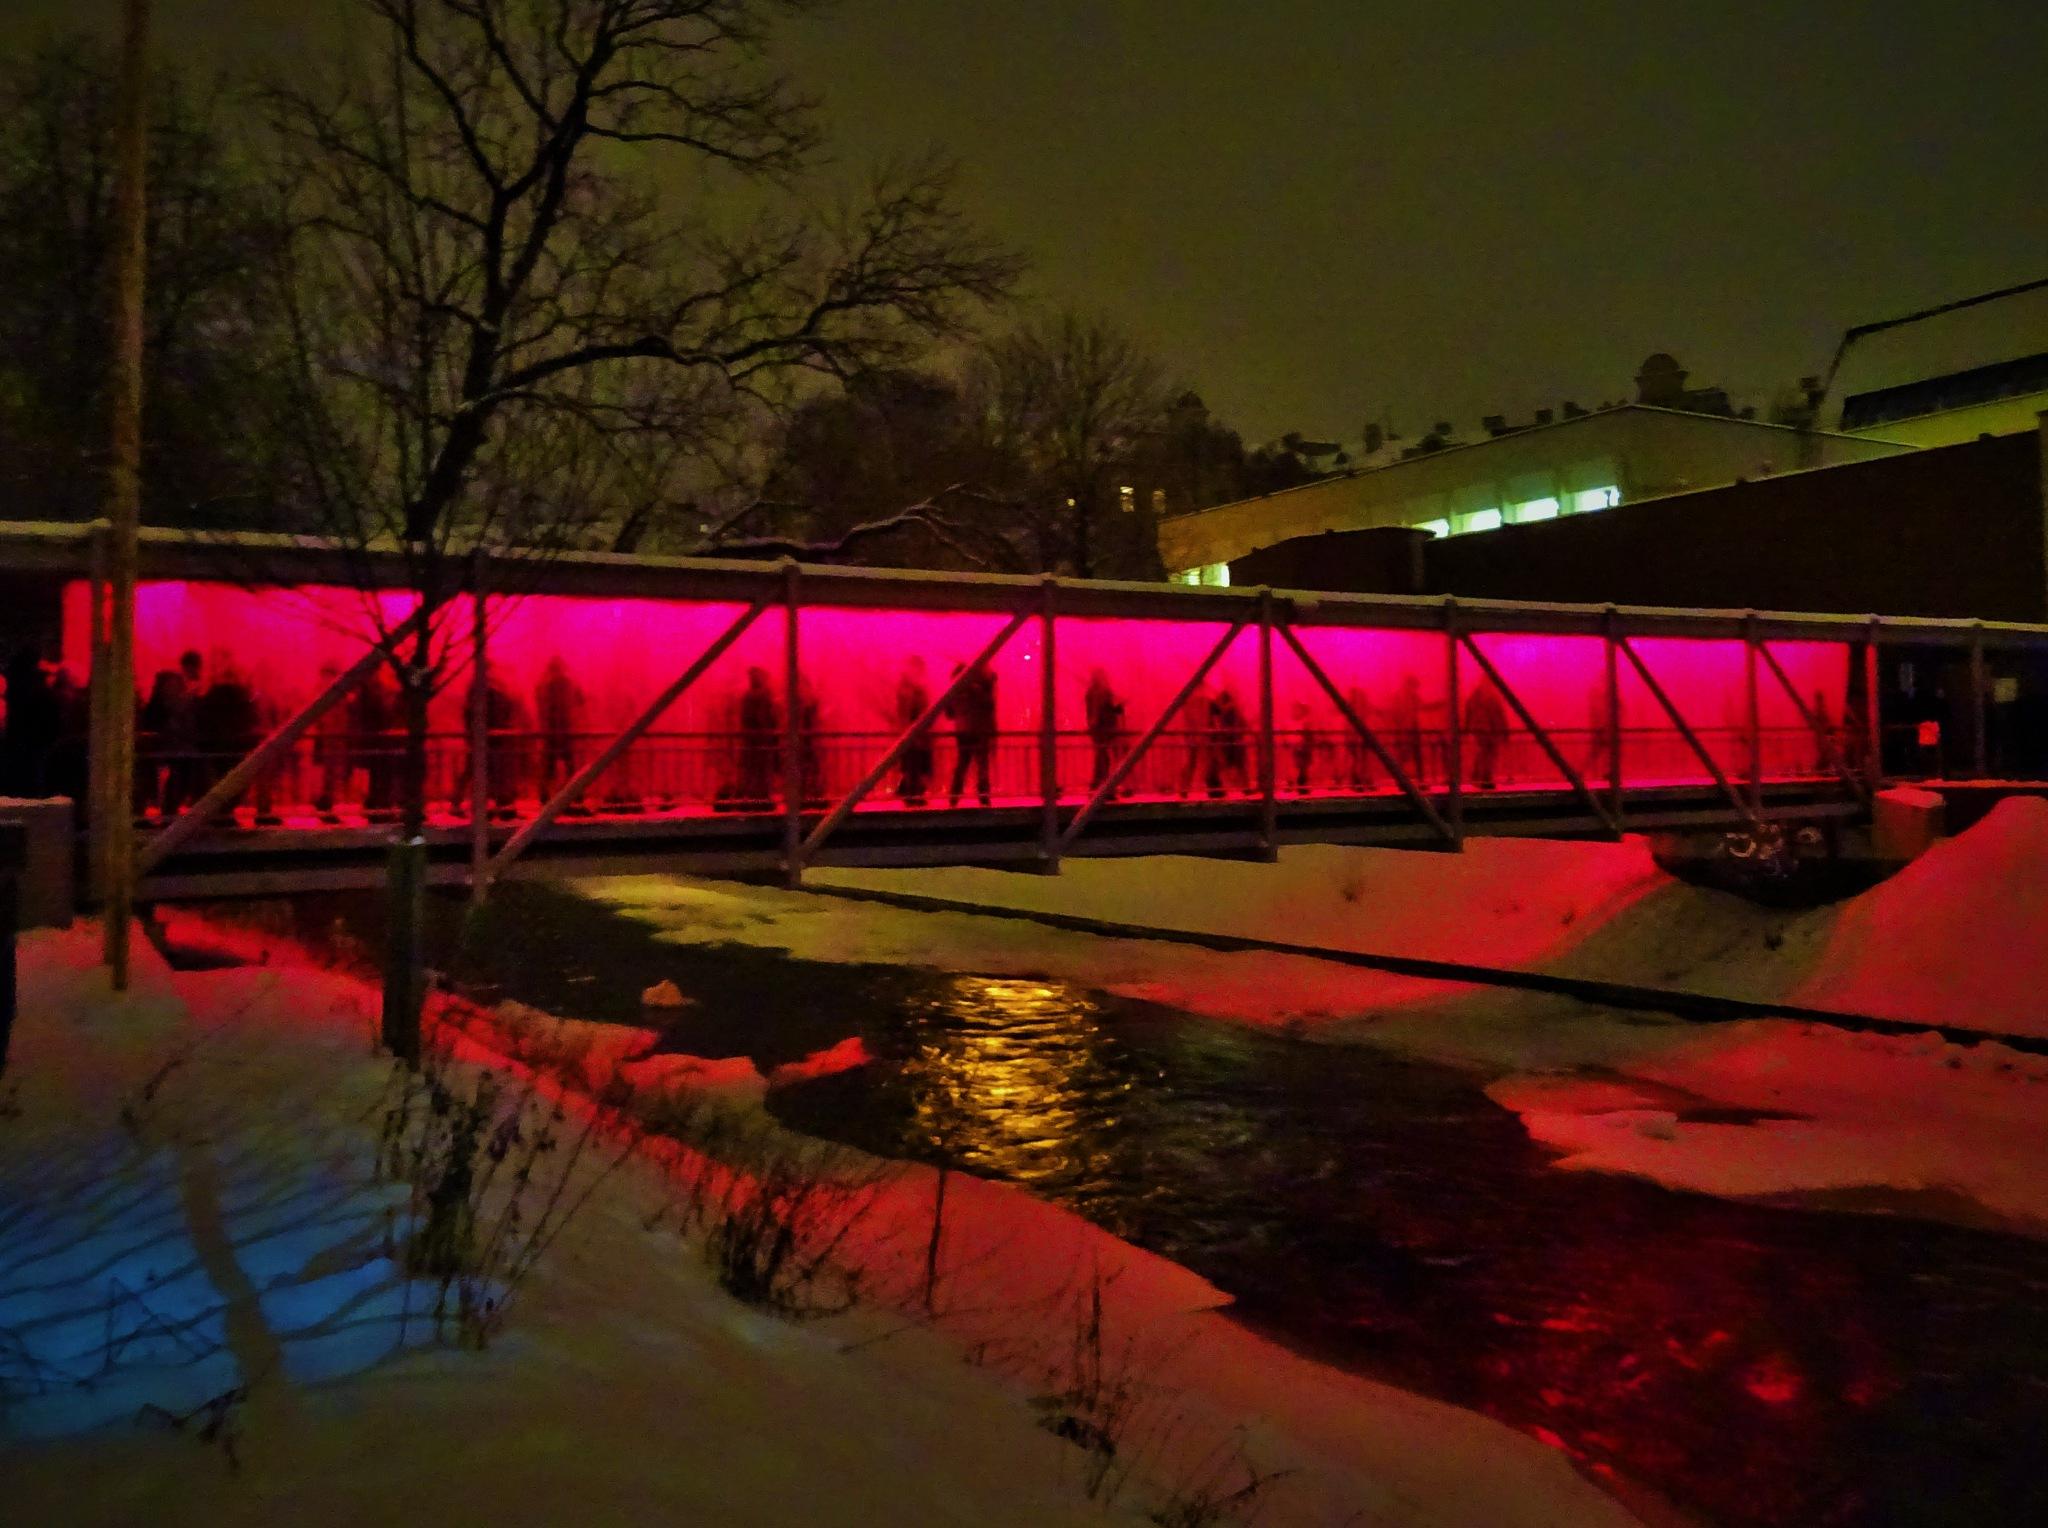 A red bridge. by vita.tucaite